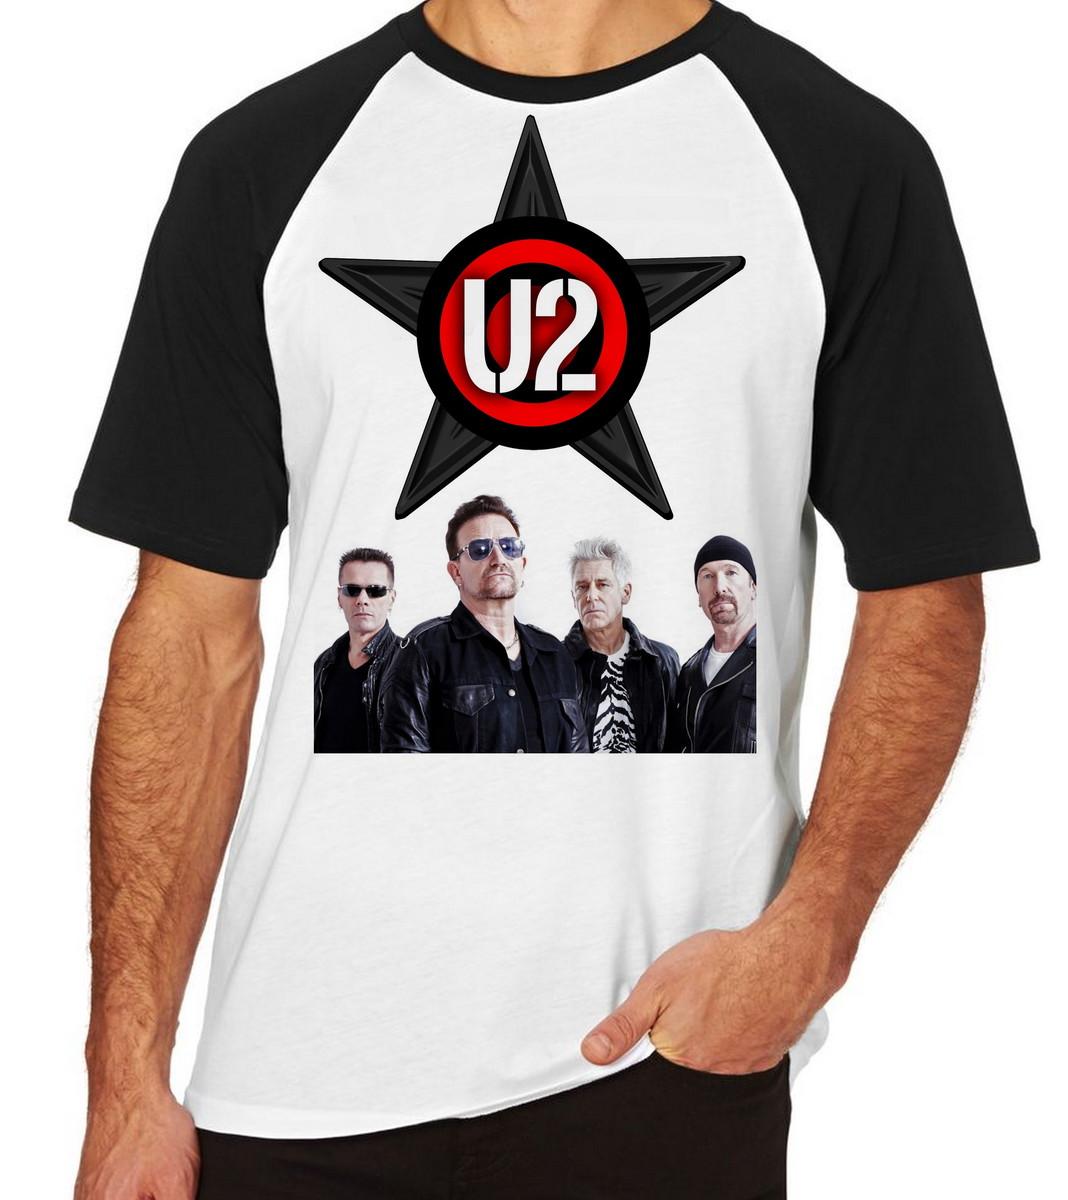 Camiseta Raglan Camisa Blusa U2 Banda Rock Bono Vox Irlanda no Elo7 ... 7d0f1ac12182e